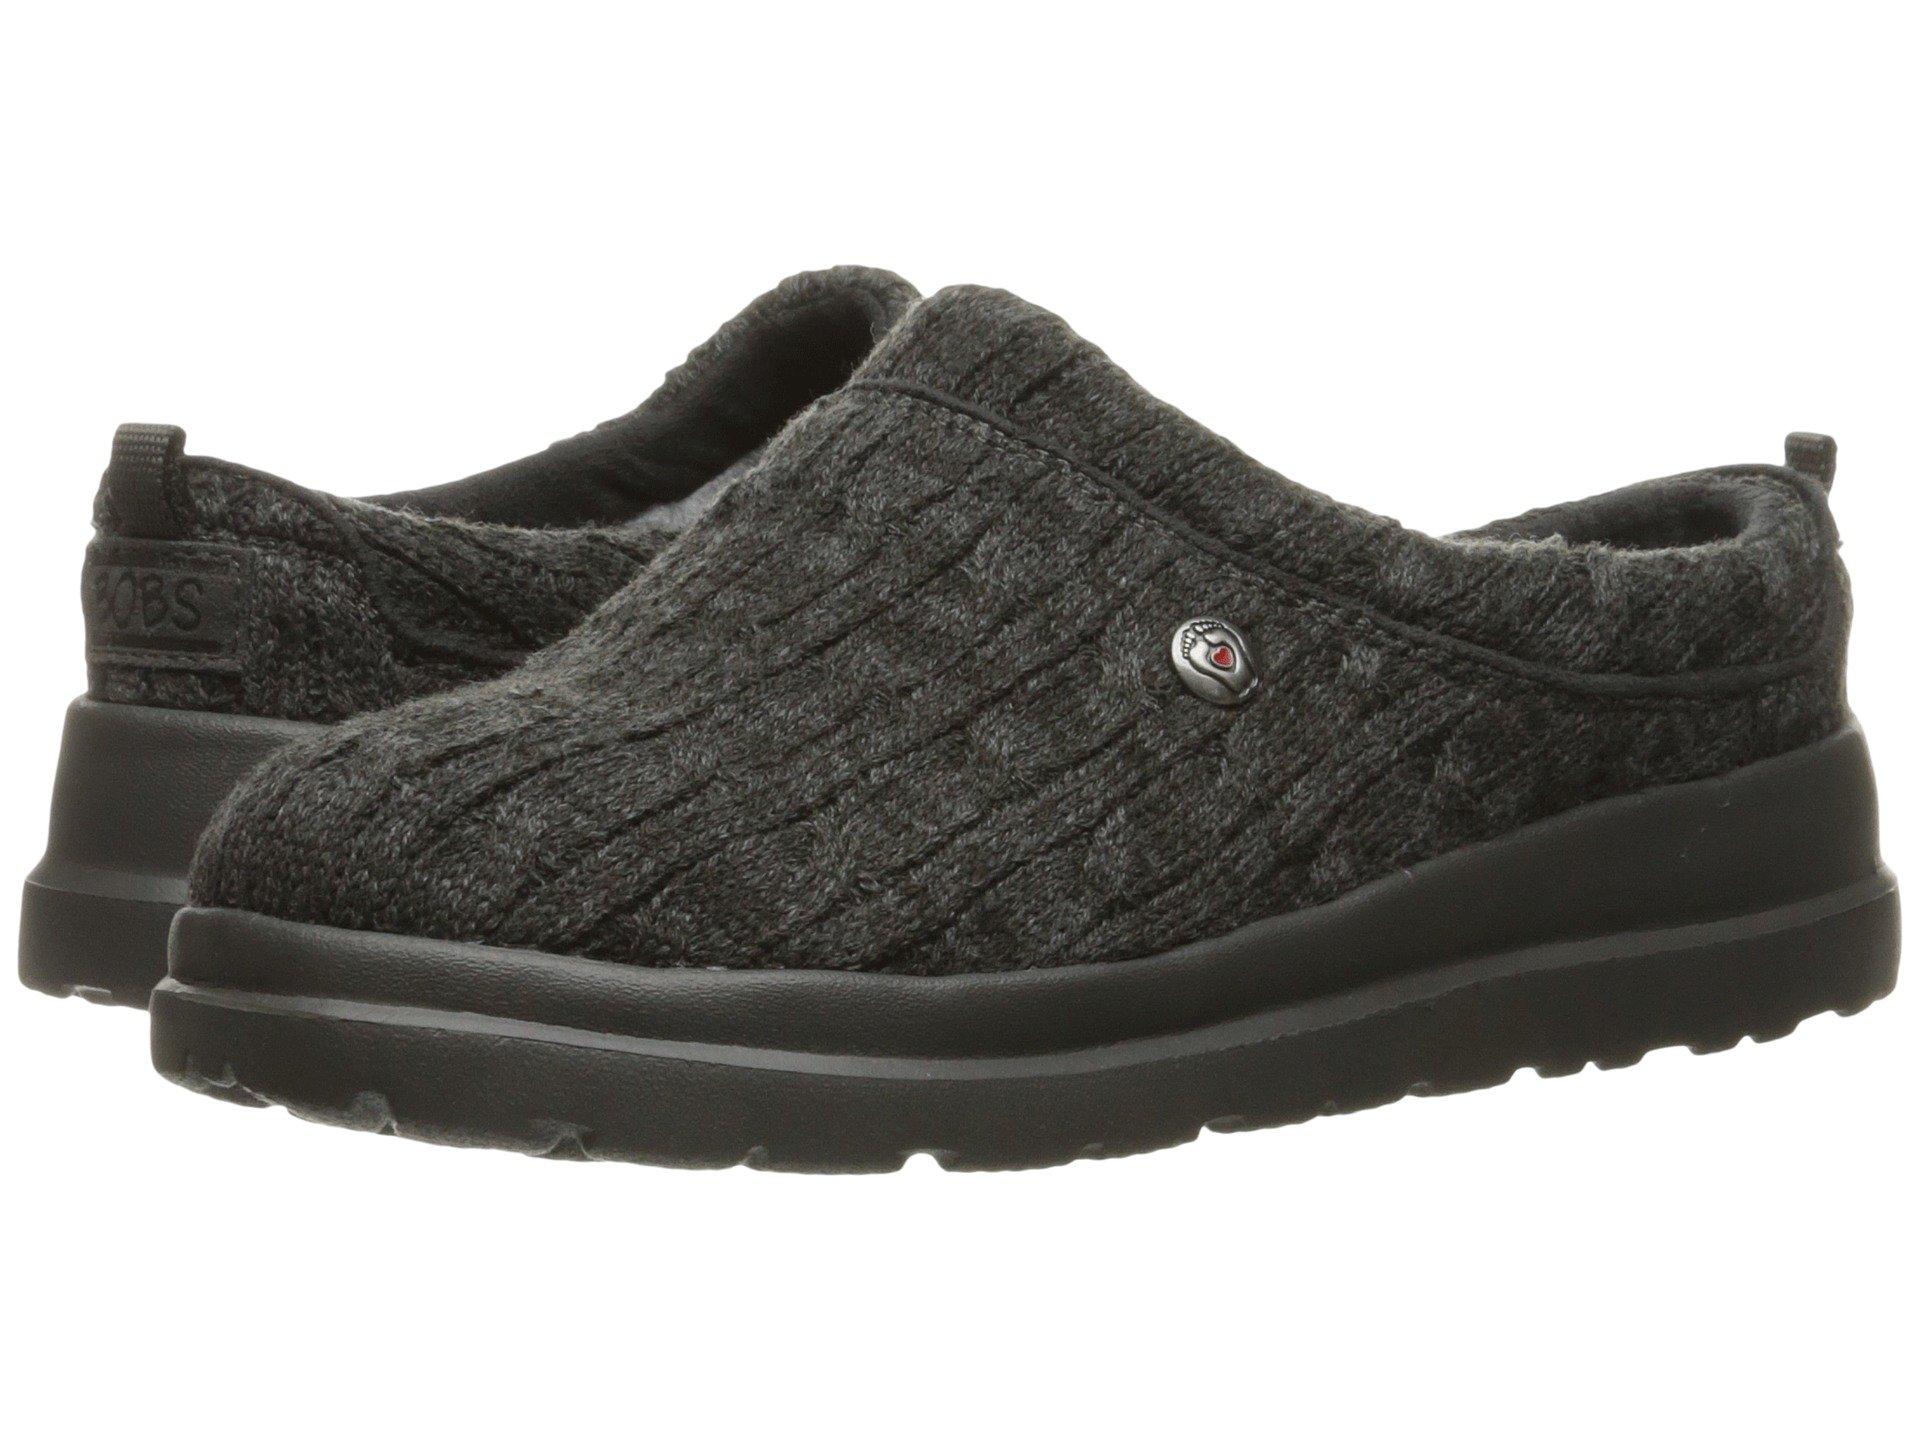 Zapato de Descanso para Mujer BOBS from SKECHERS Cherish - Bob-Sled  + SKECHERS en VeoyCompro.net